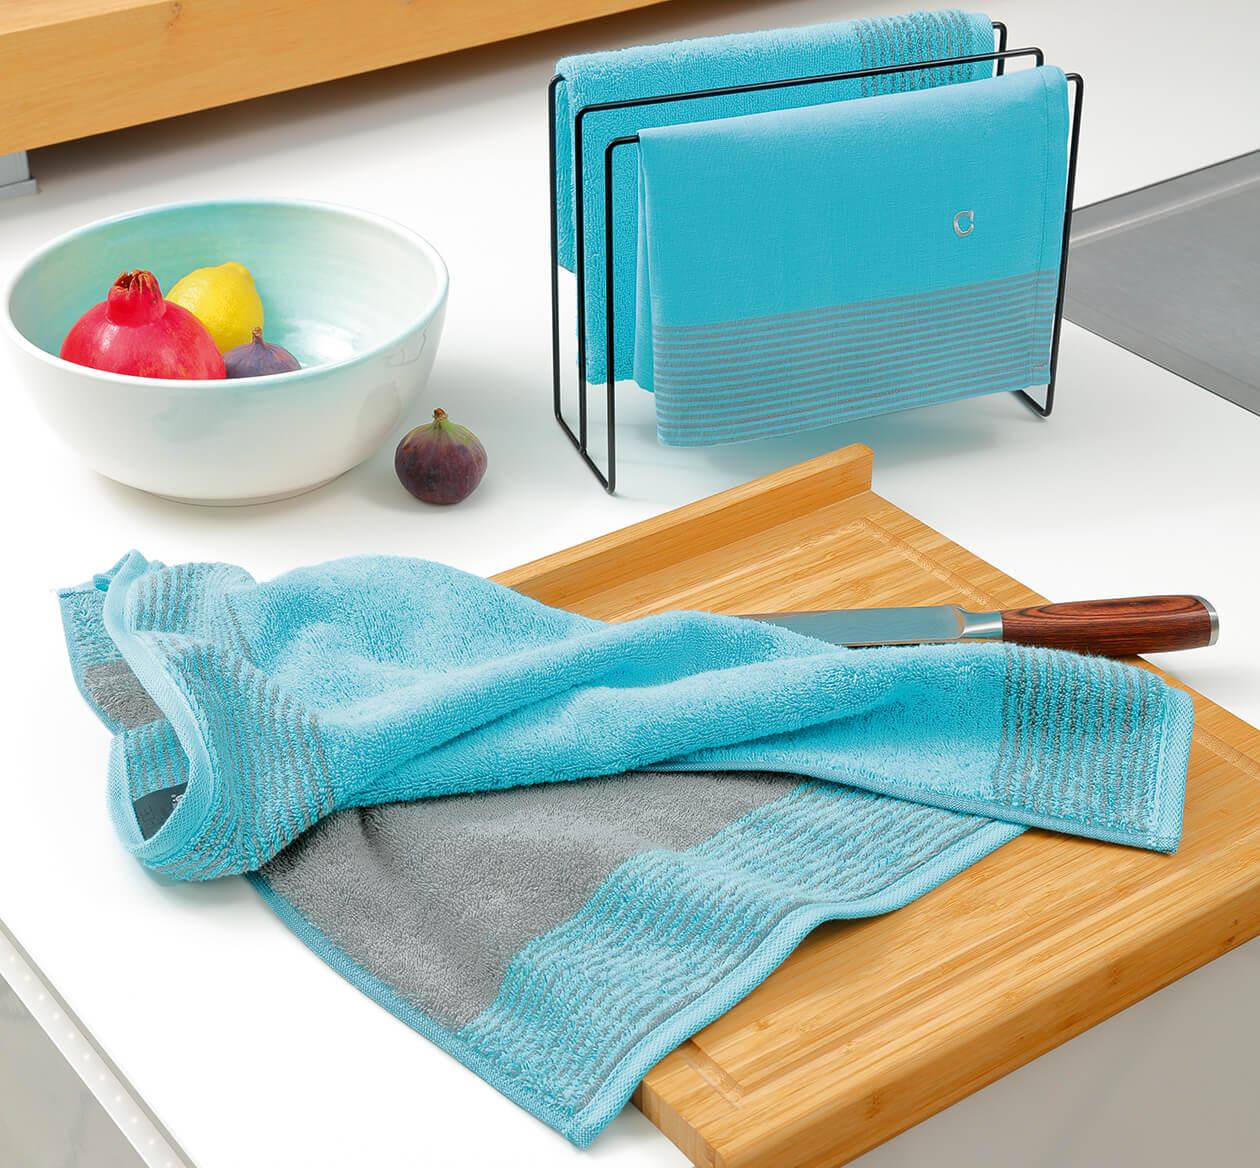 Cawö Two-Tone 590 - Küchenhandtuch 50x50 cm - Farbe: blau - 17 Detailbild 2